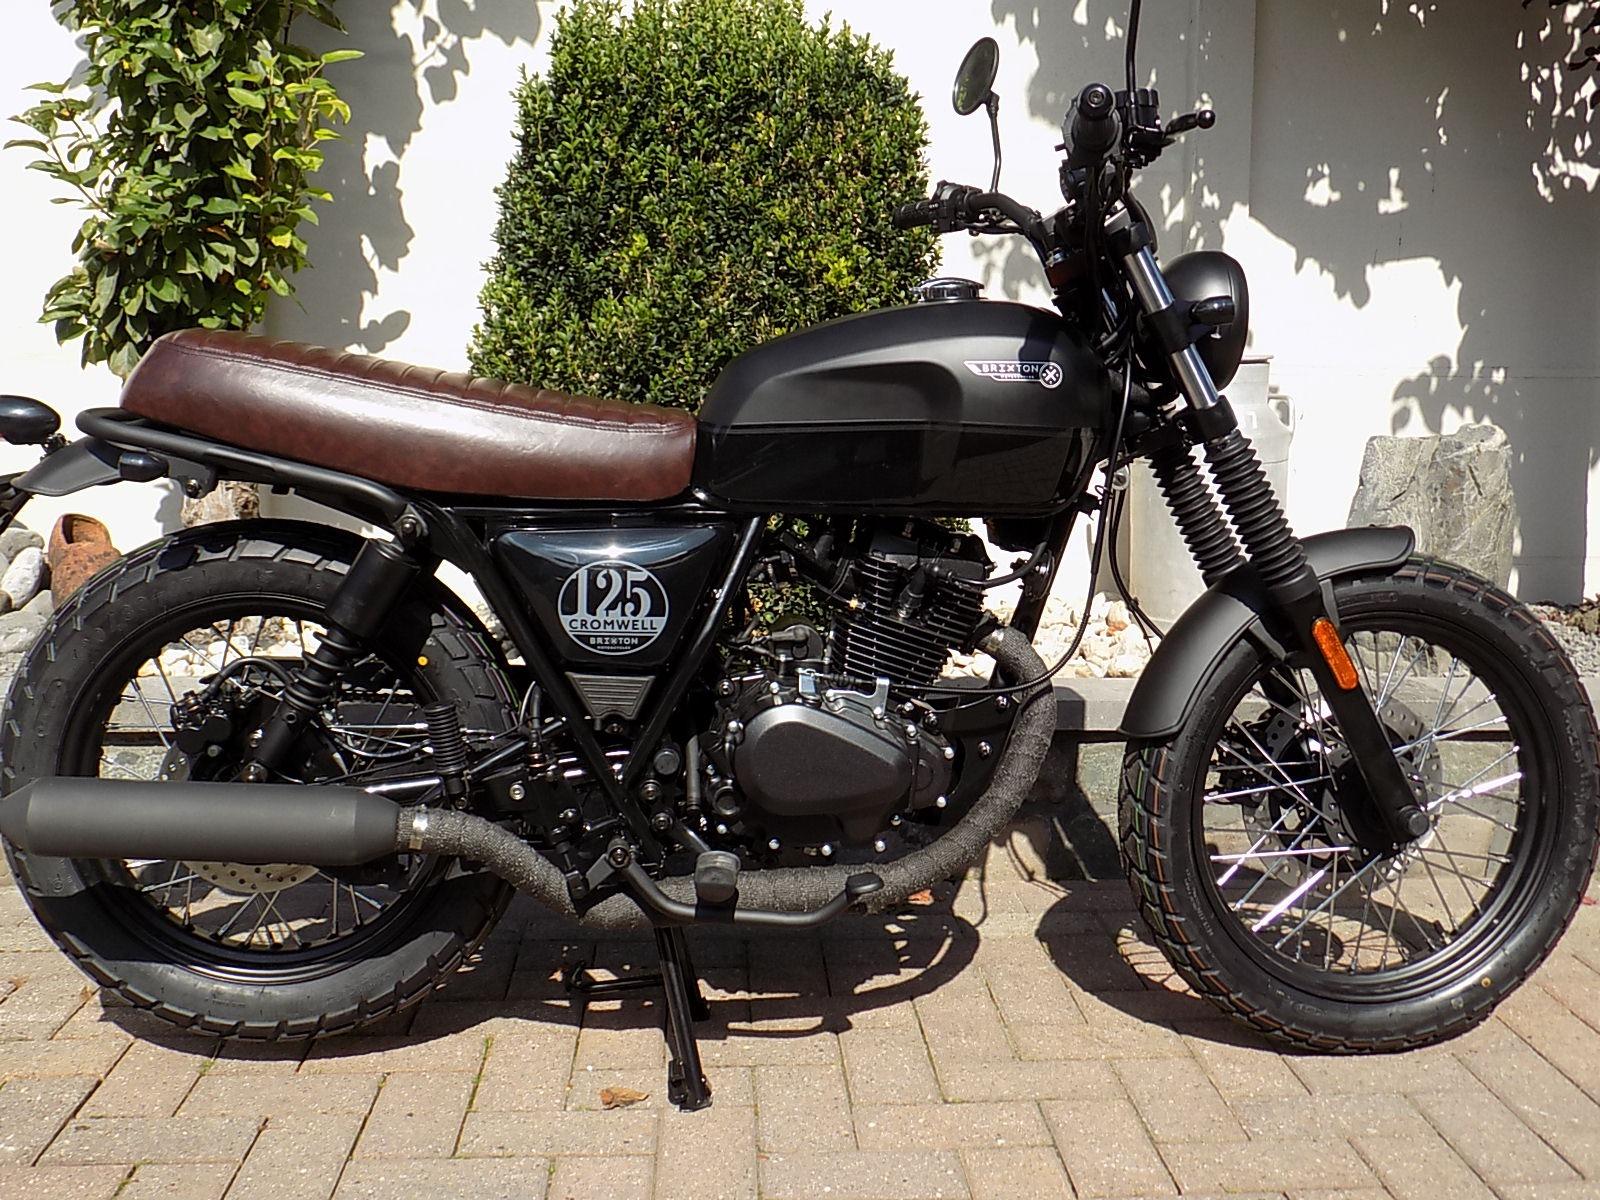 Brixton cromwell 125cc (EURO 5) ABS!!